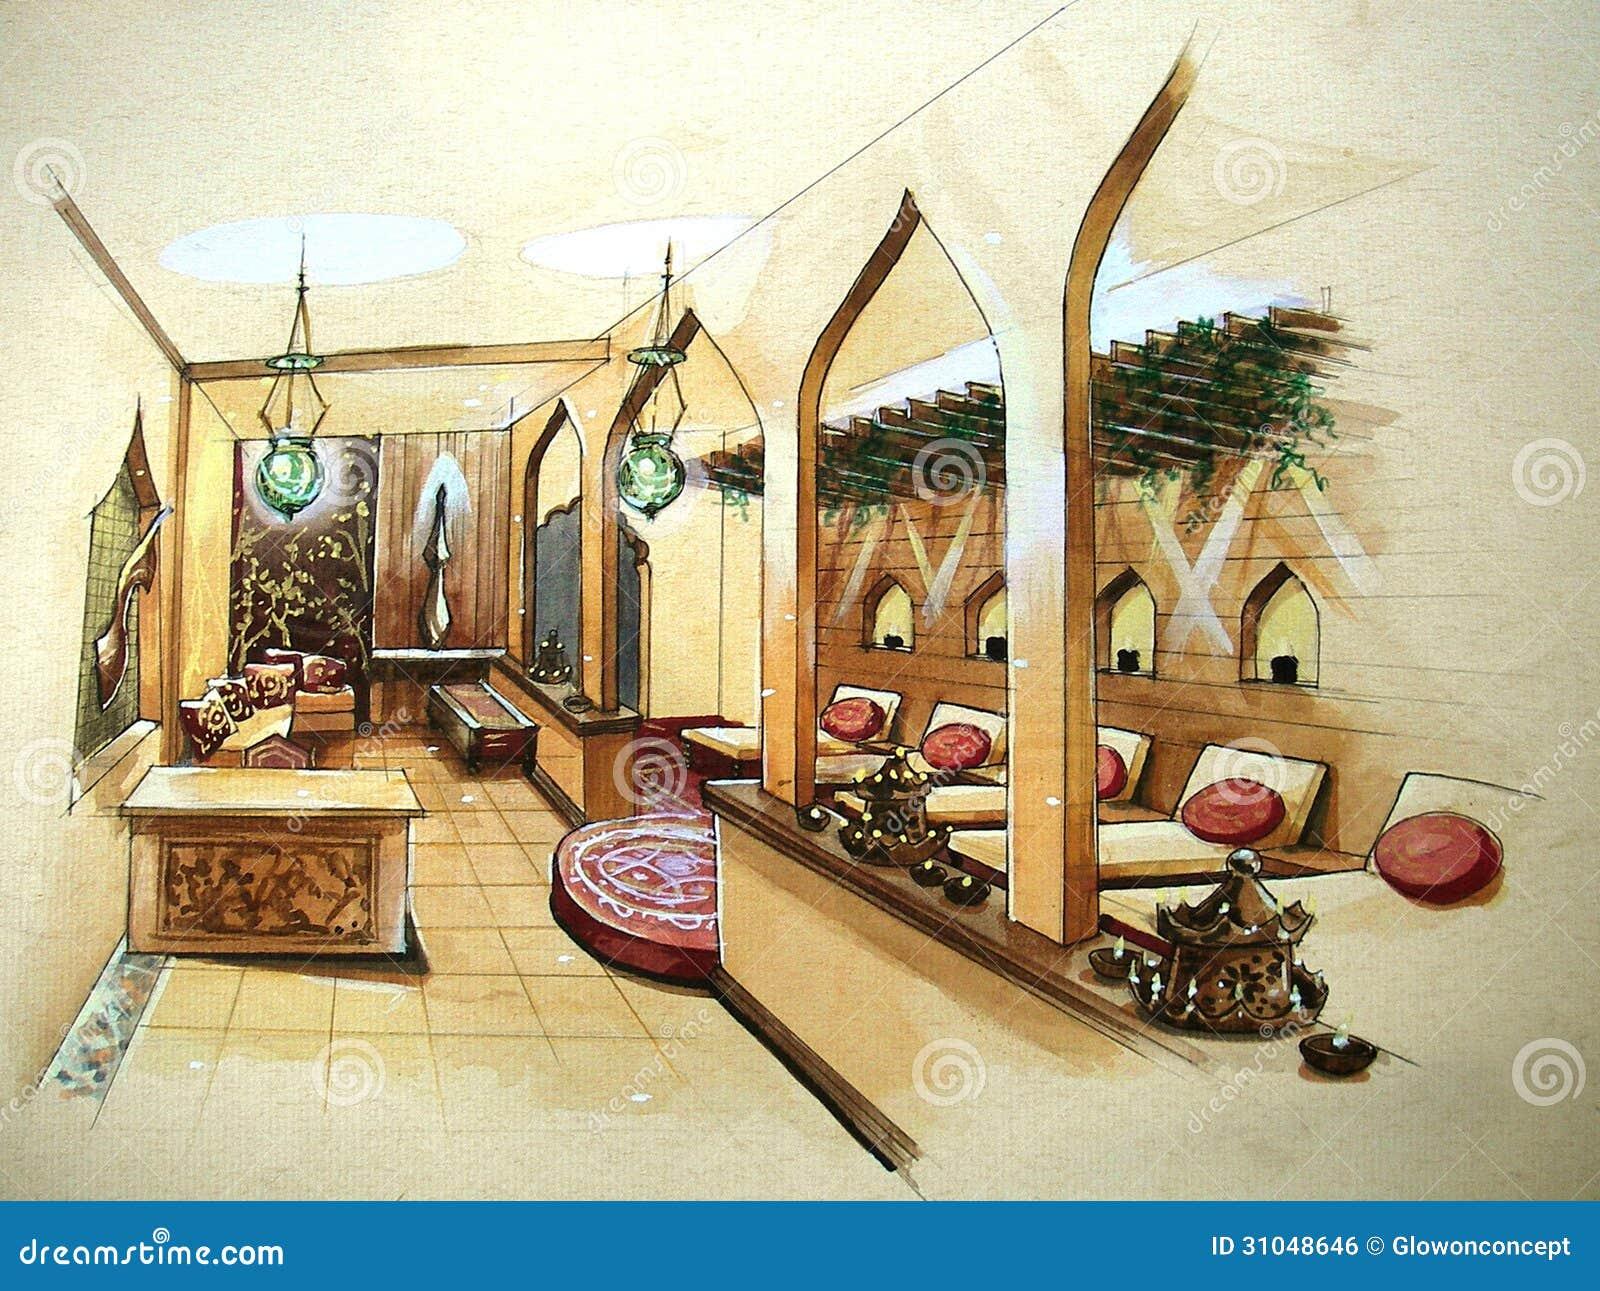 Spa Design Interior Illustration Royalty Free Stock Image